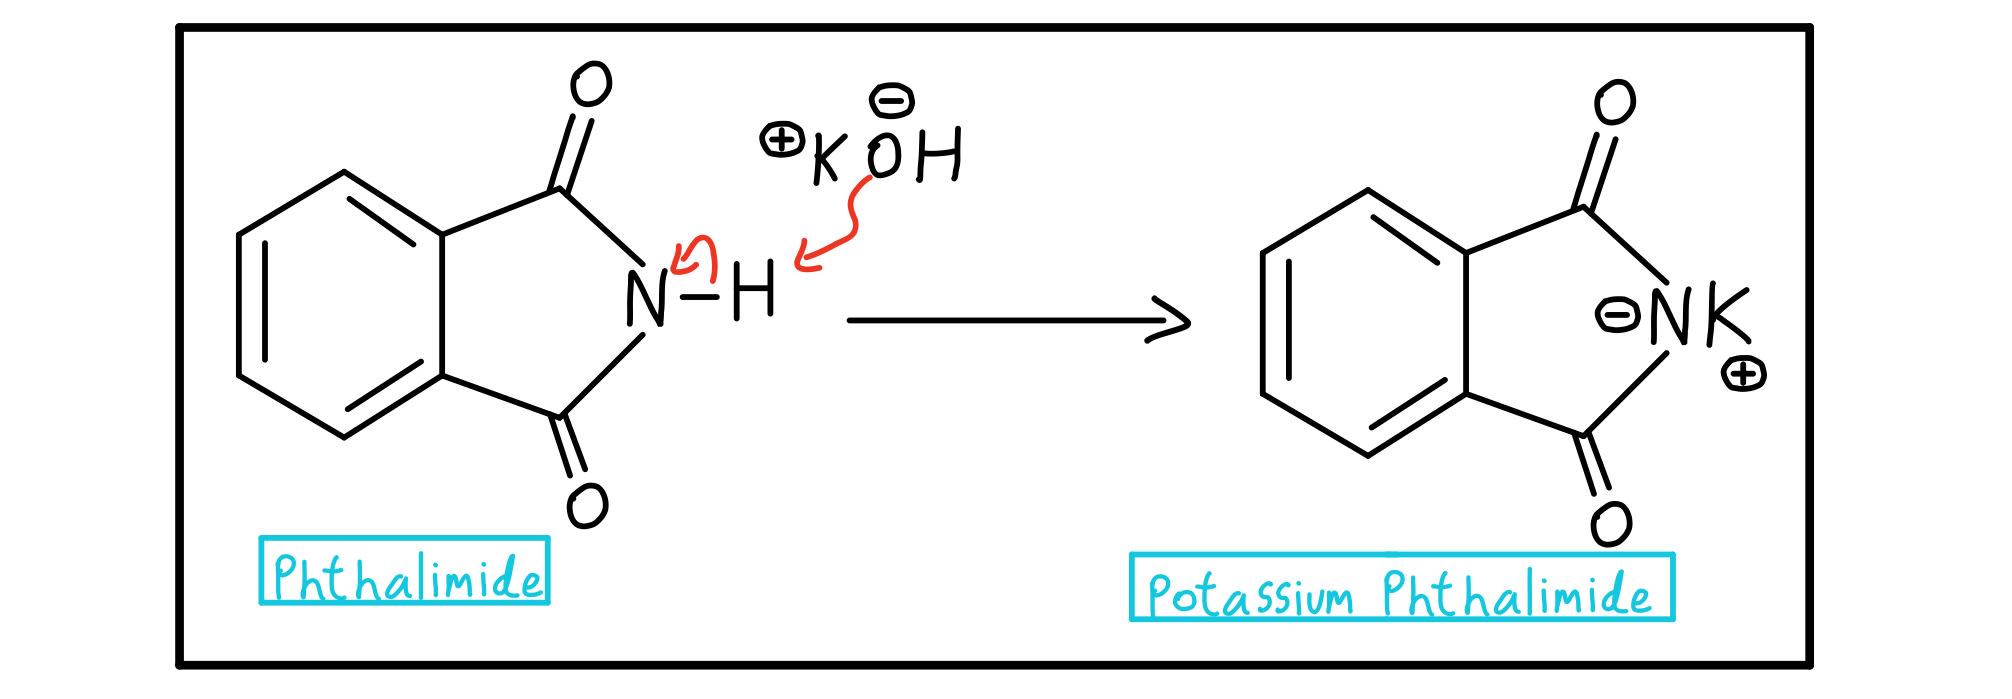 Nitrogen deprotonation